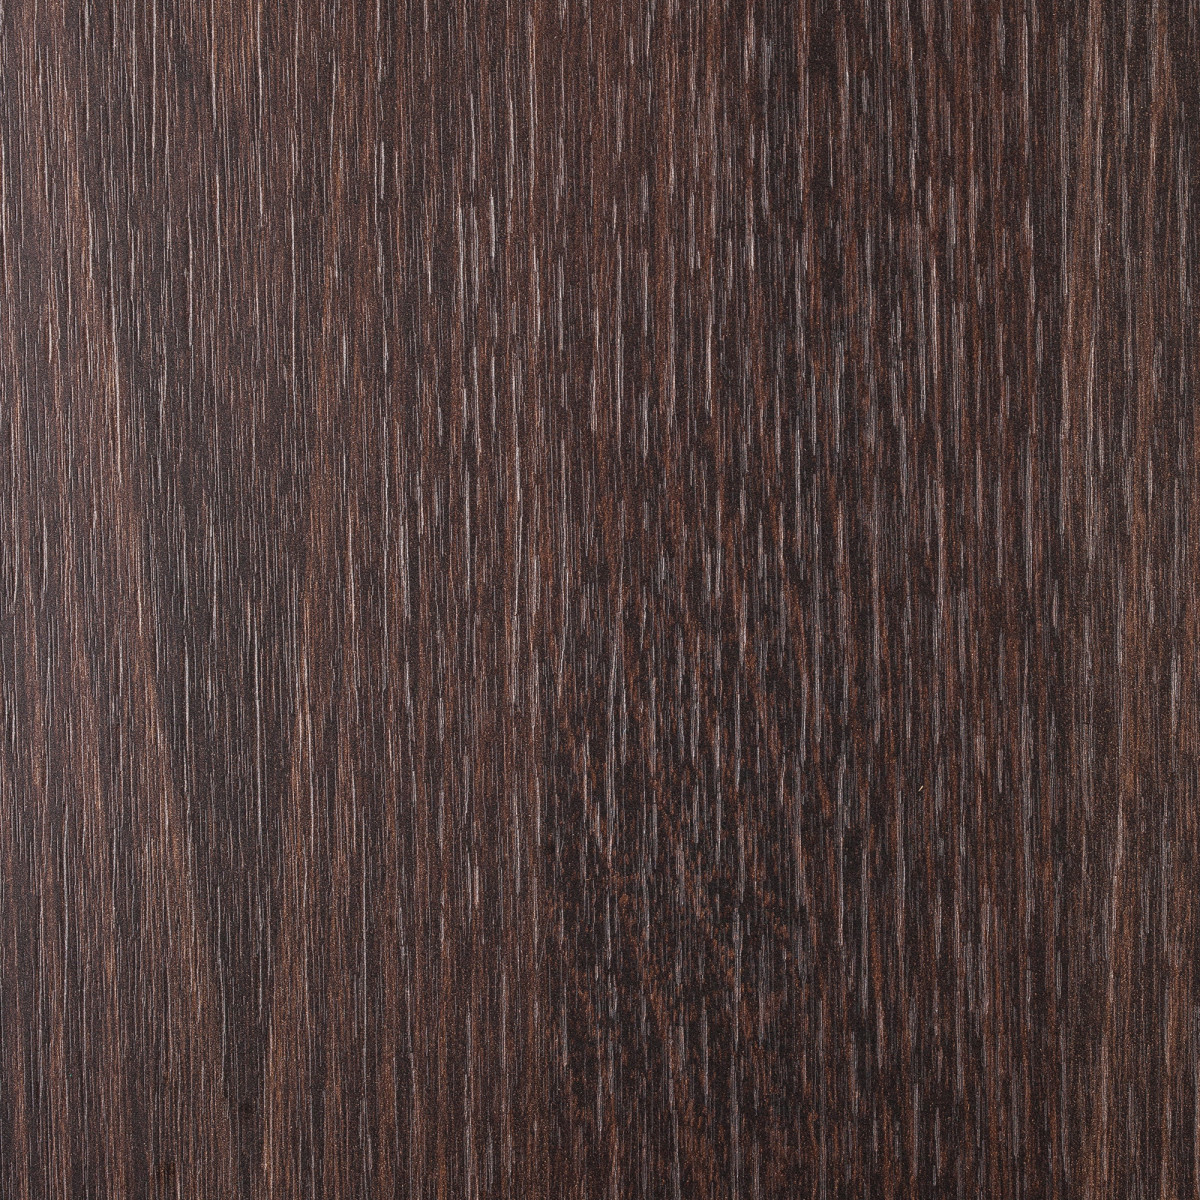 Деталь мебельная 1200х300х16 мм ЛДСП цвет дуб термо темный кромка со всех сторон